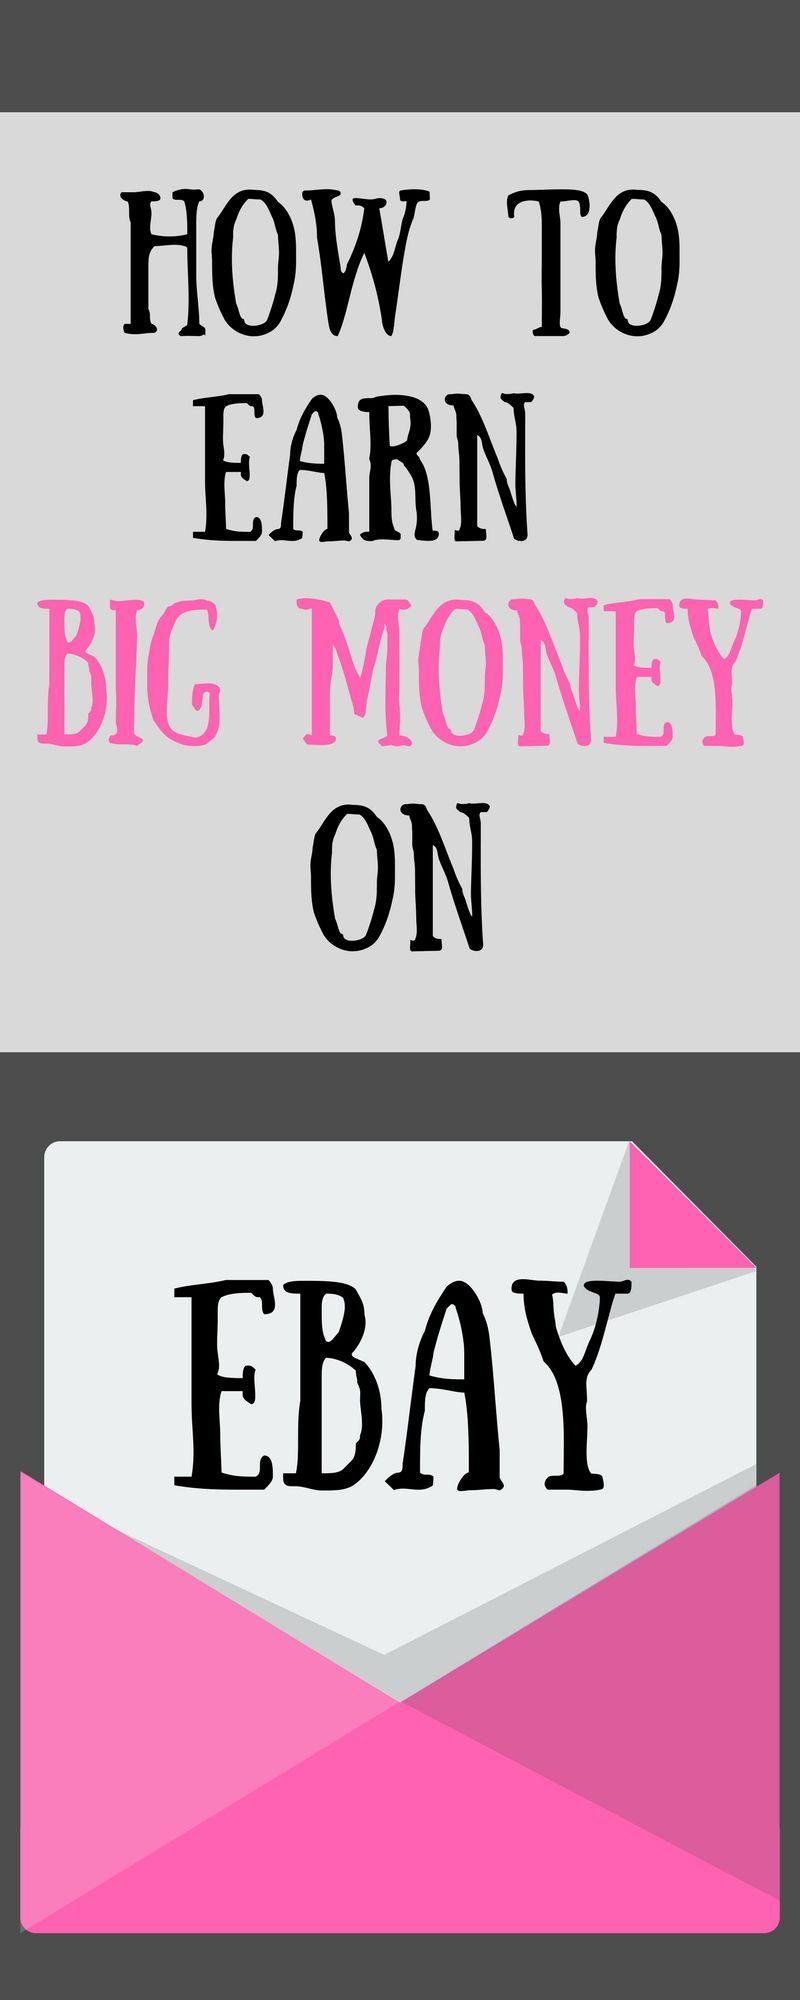 make money on ebay/ebay selling tips/how to sell on ebay/how to set up an ebay business/selling on ebay/ways to make money on ebay/how to earn big money/make money from home uk/make money online